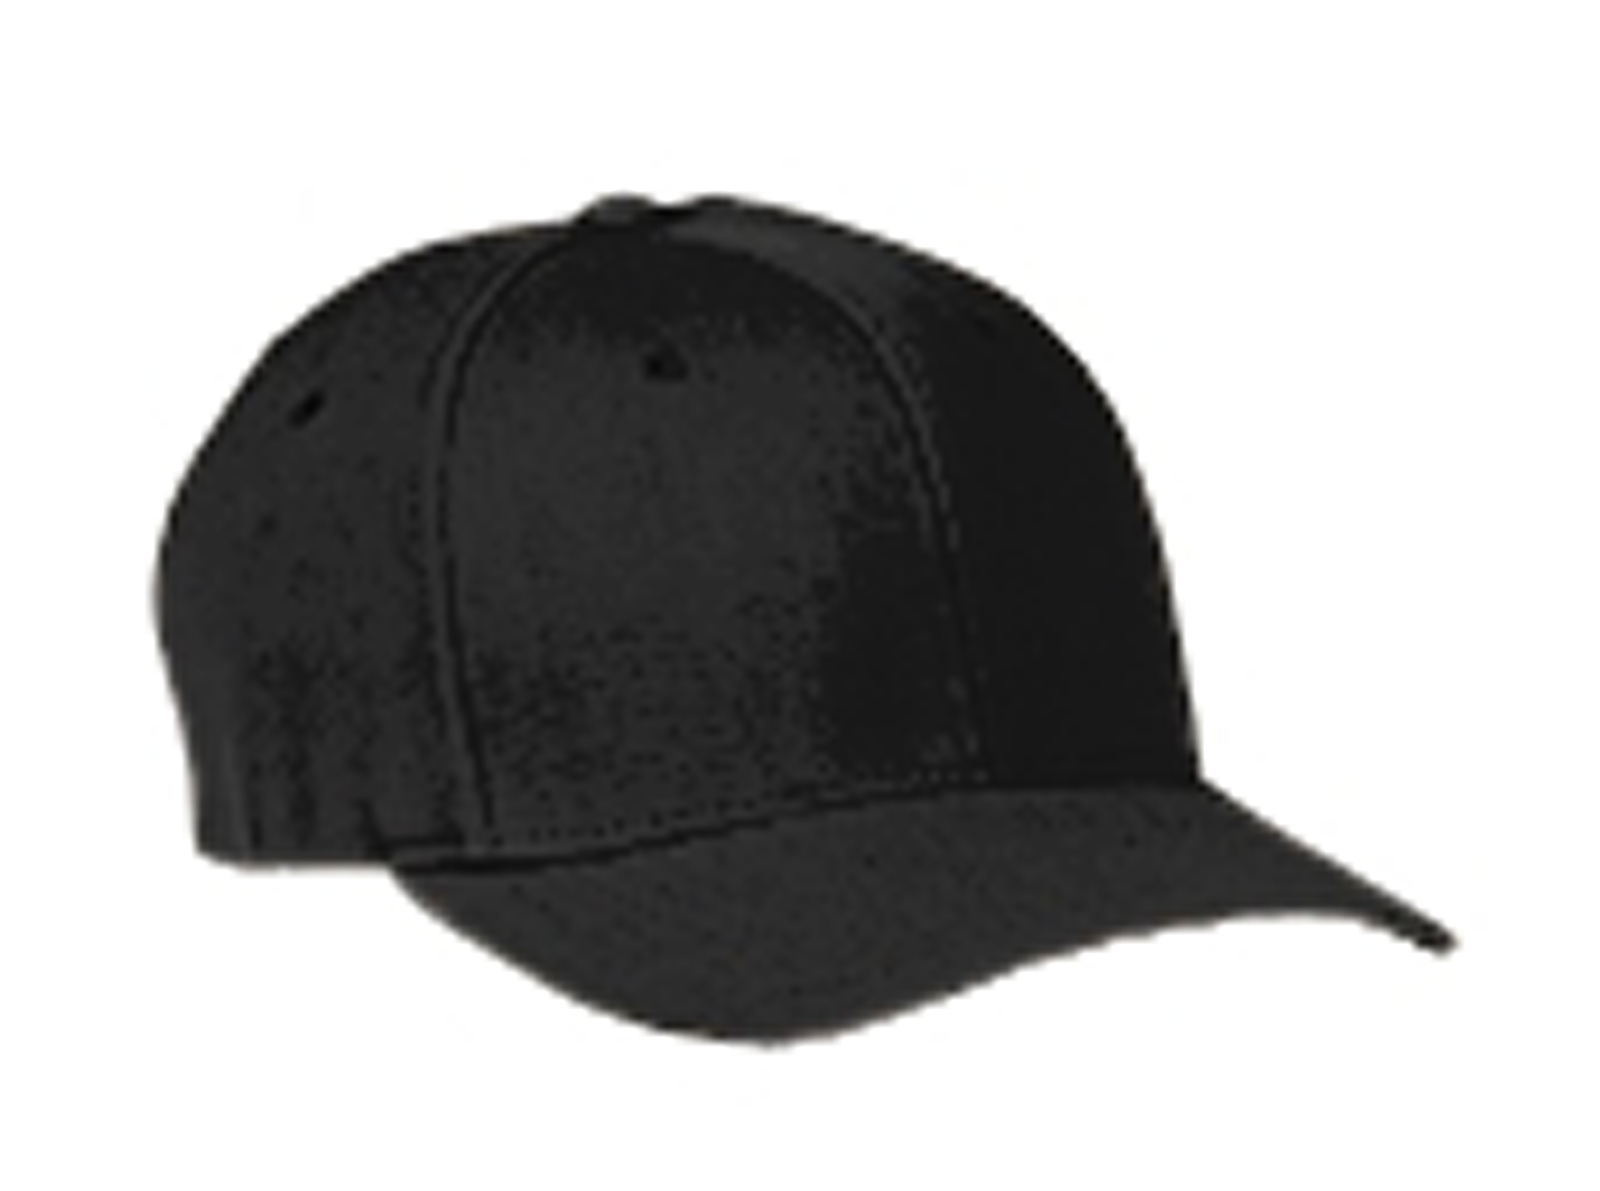 Flexfit 6477 成年人羊毛混合帽子